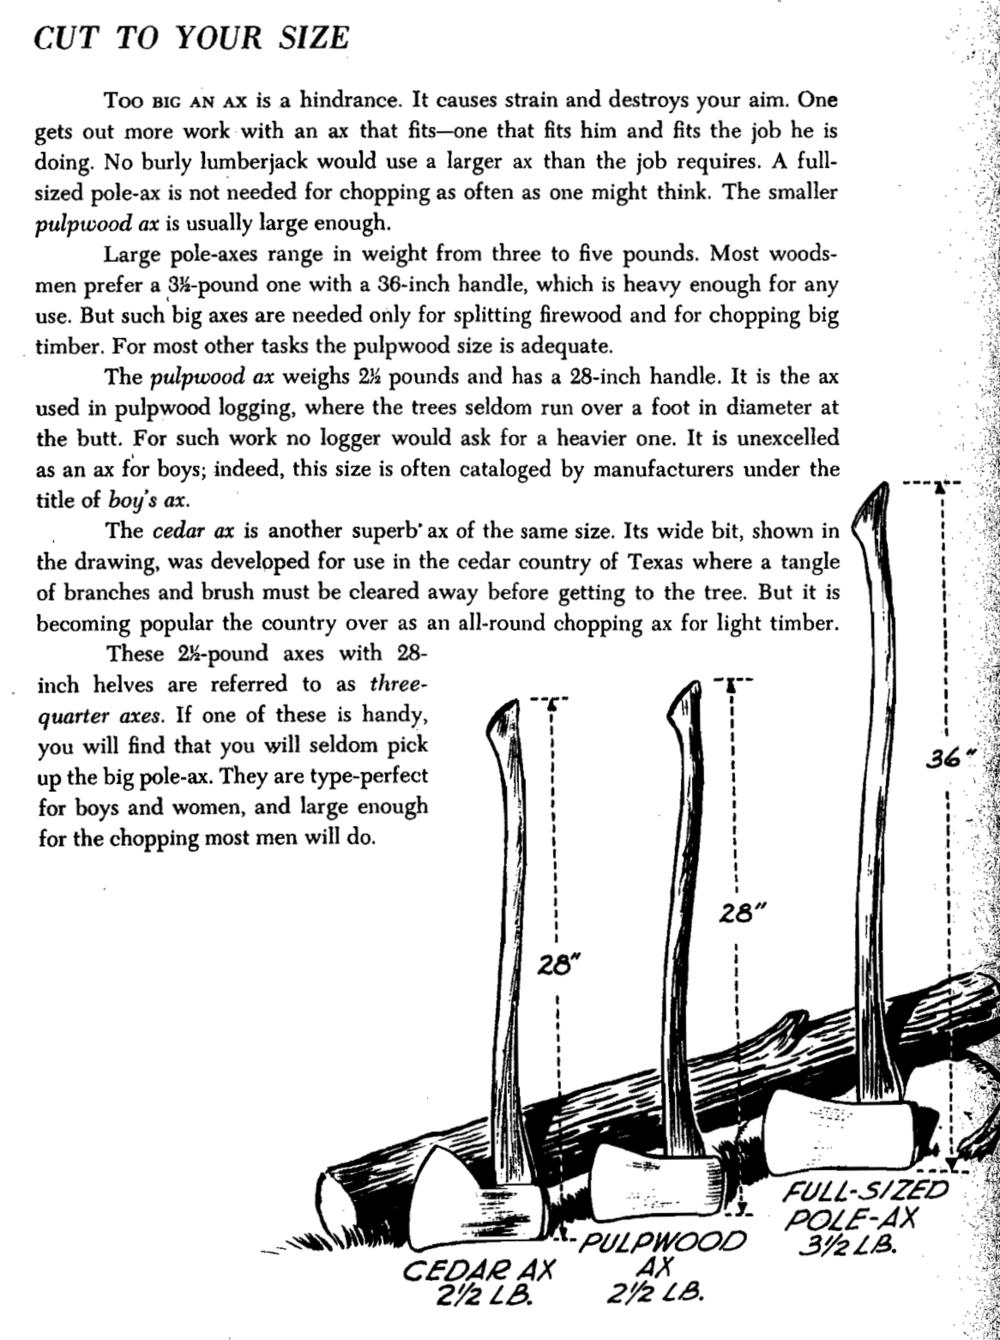 Page from Bernard S. Mason's Woodsmanship